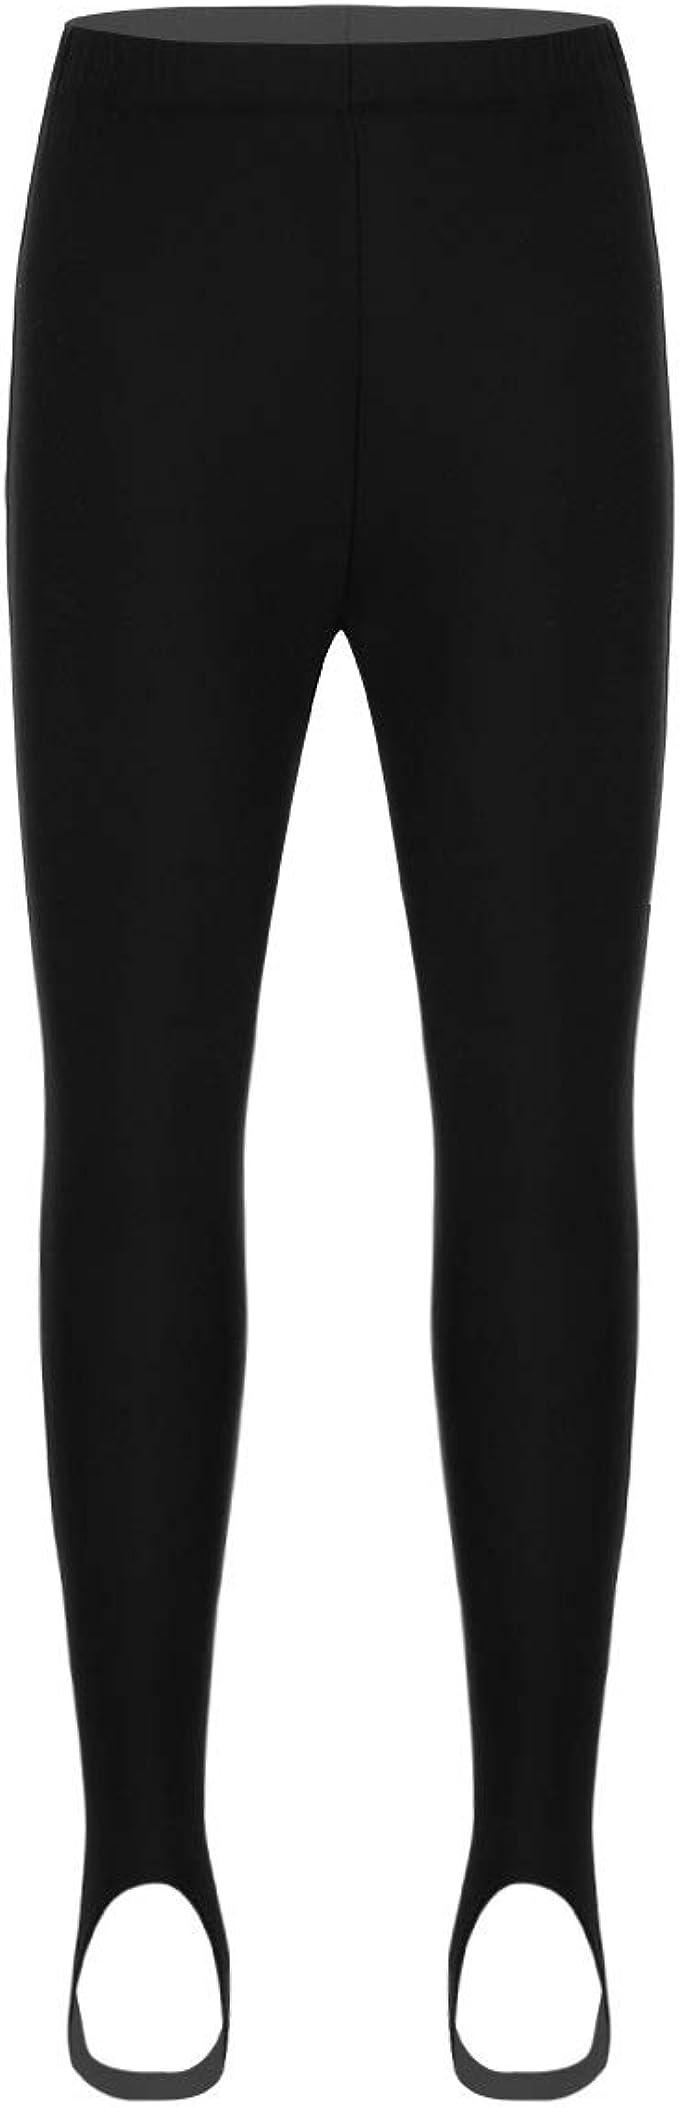 winying Unisex Girls Boys Stirrup Athletic Leggings Pants Dance Sports Yoga Tights Pantyhose